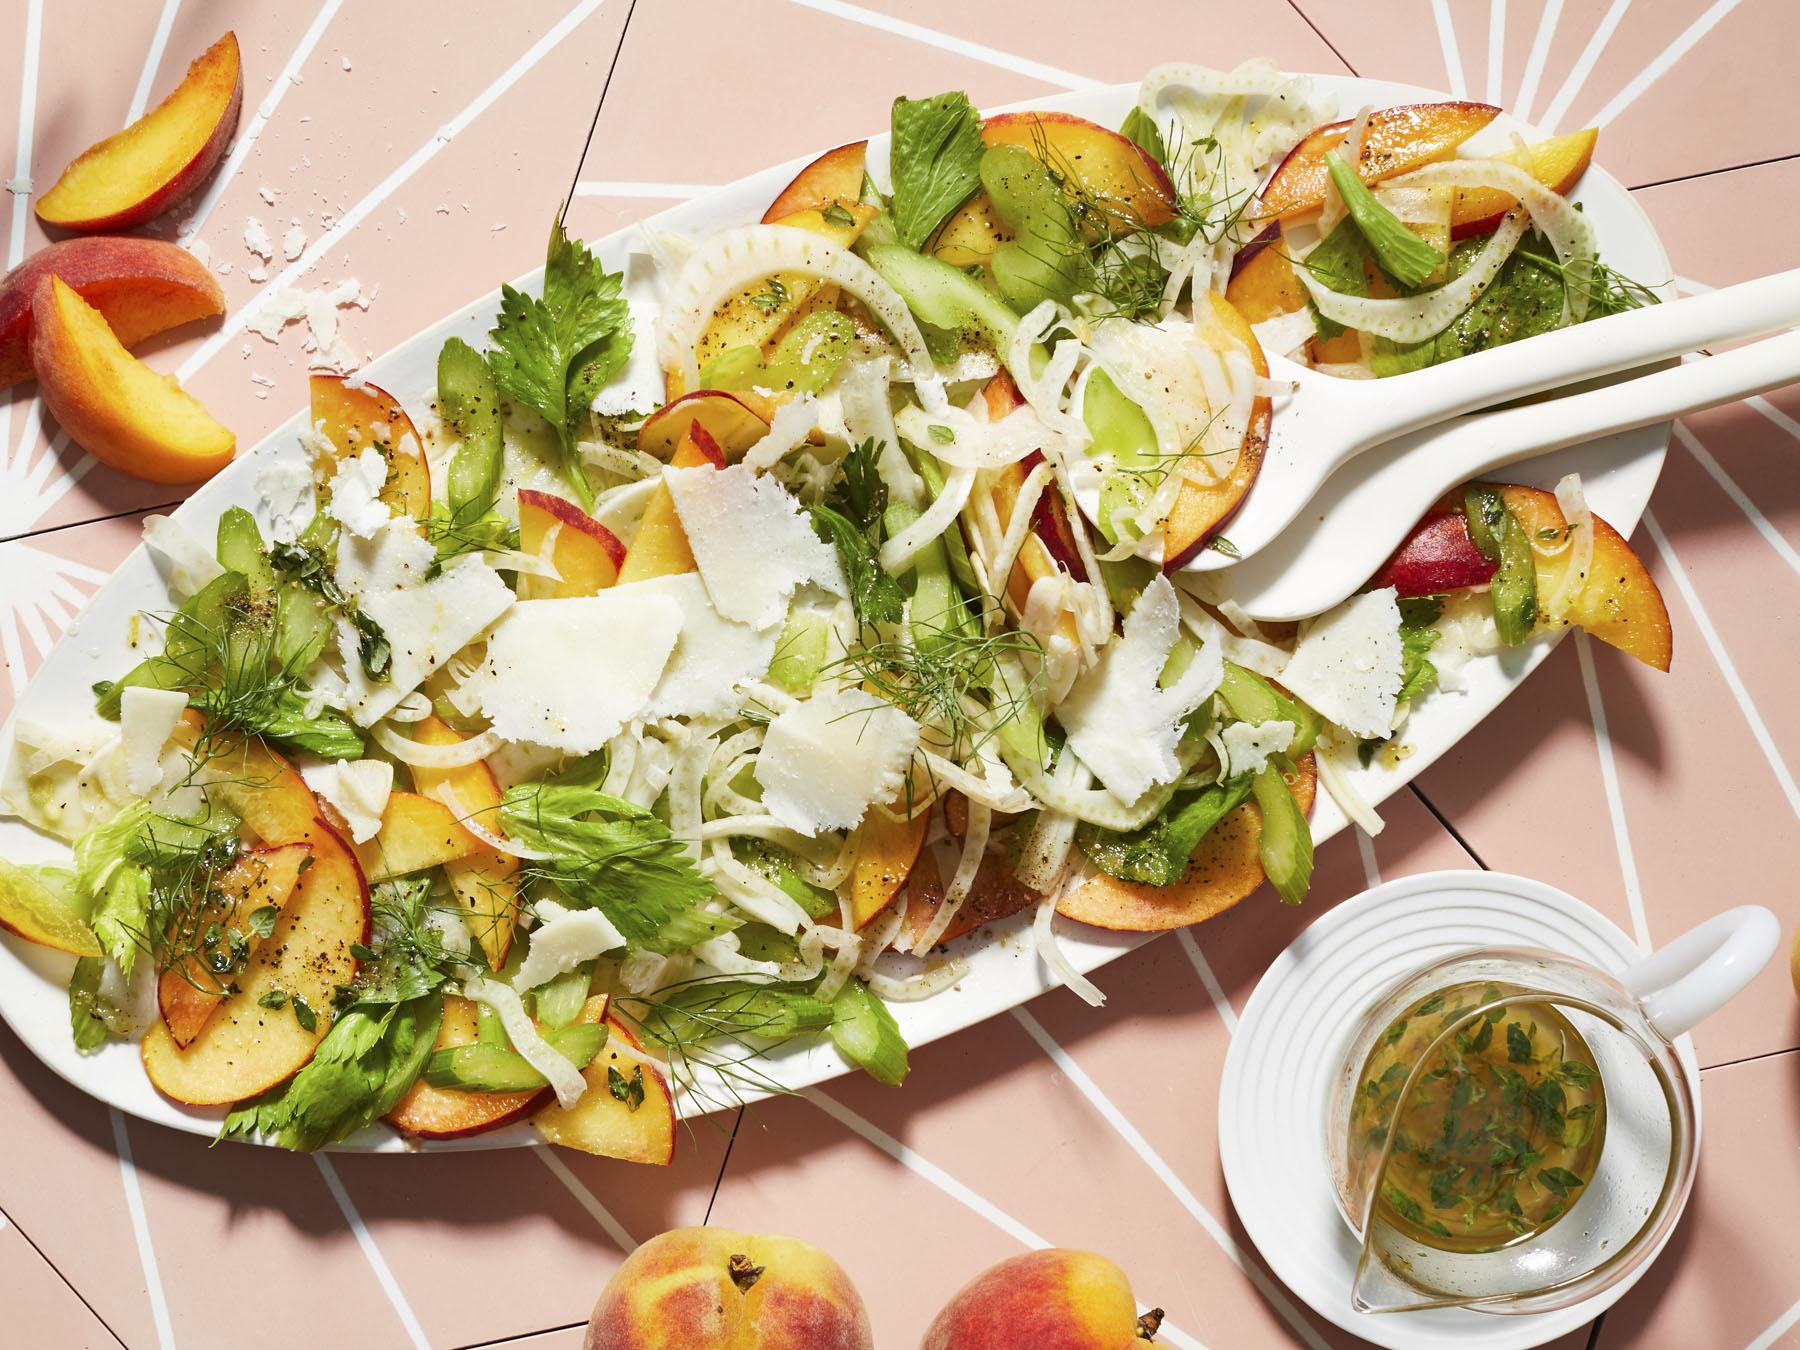 Peach-Fennel Salad with Pecorino